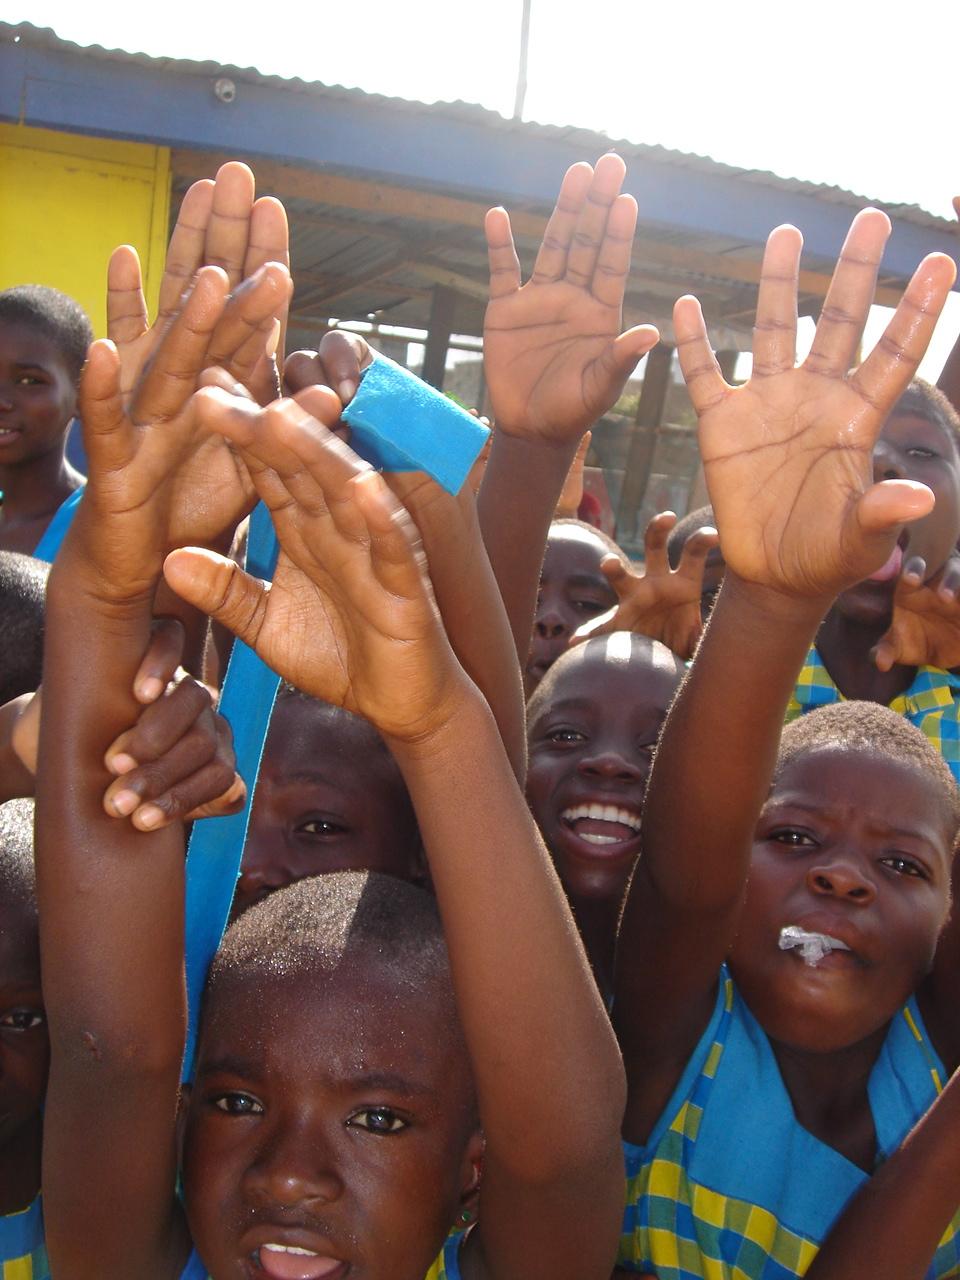 Children at the Challenging Heights school